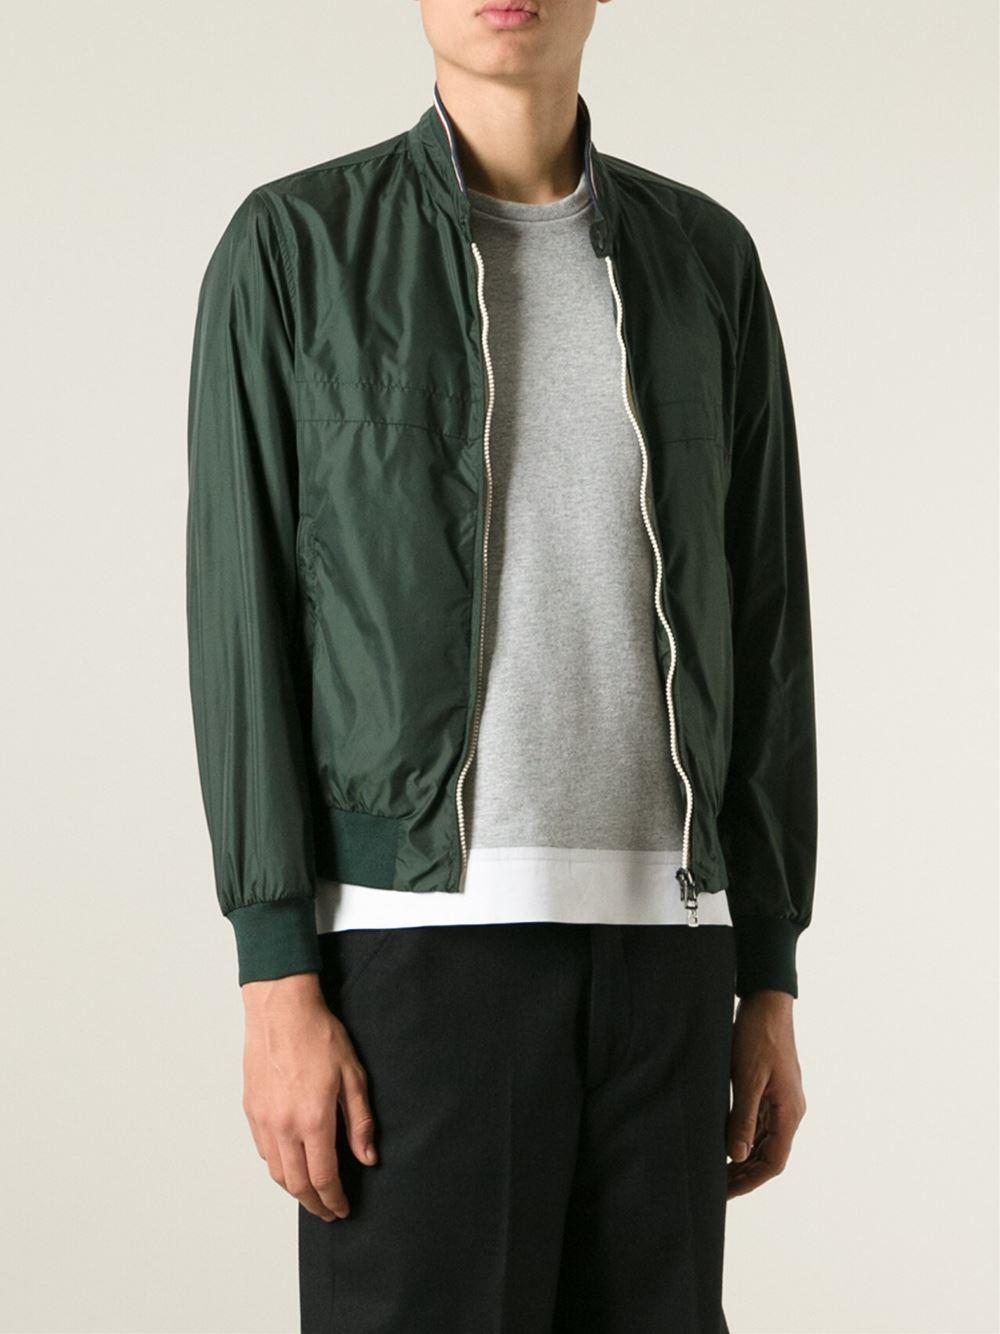 moncler green bomber jacket